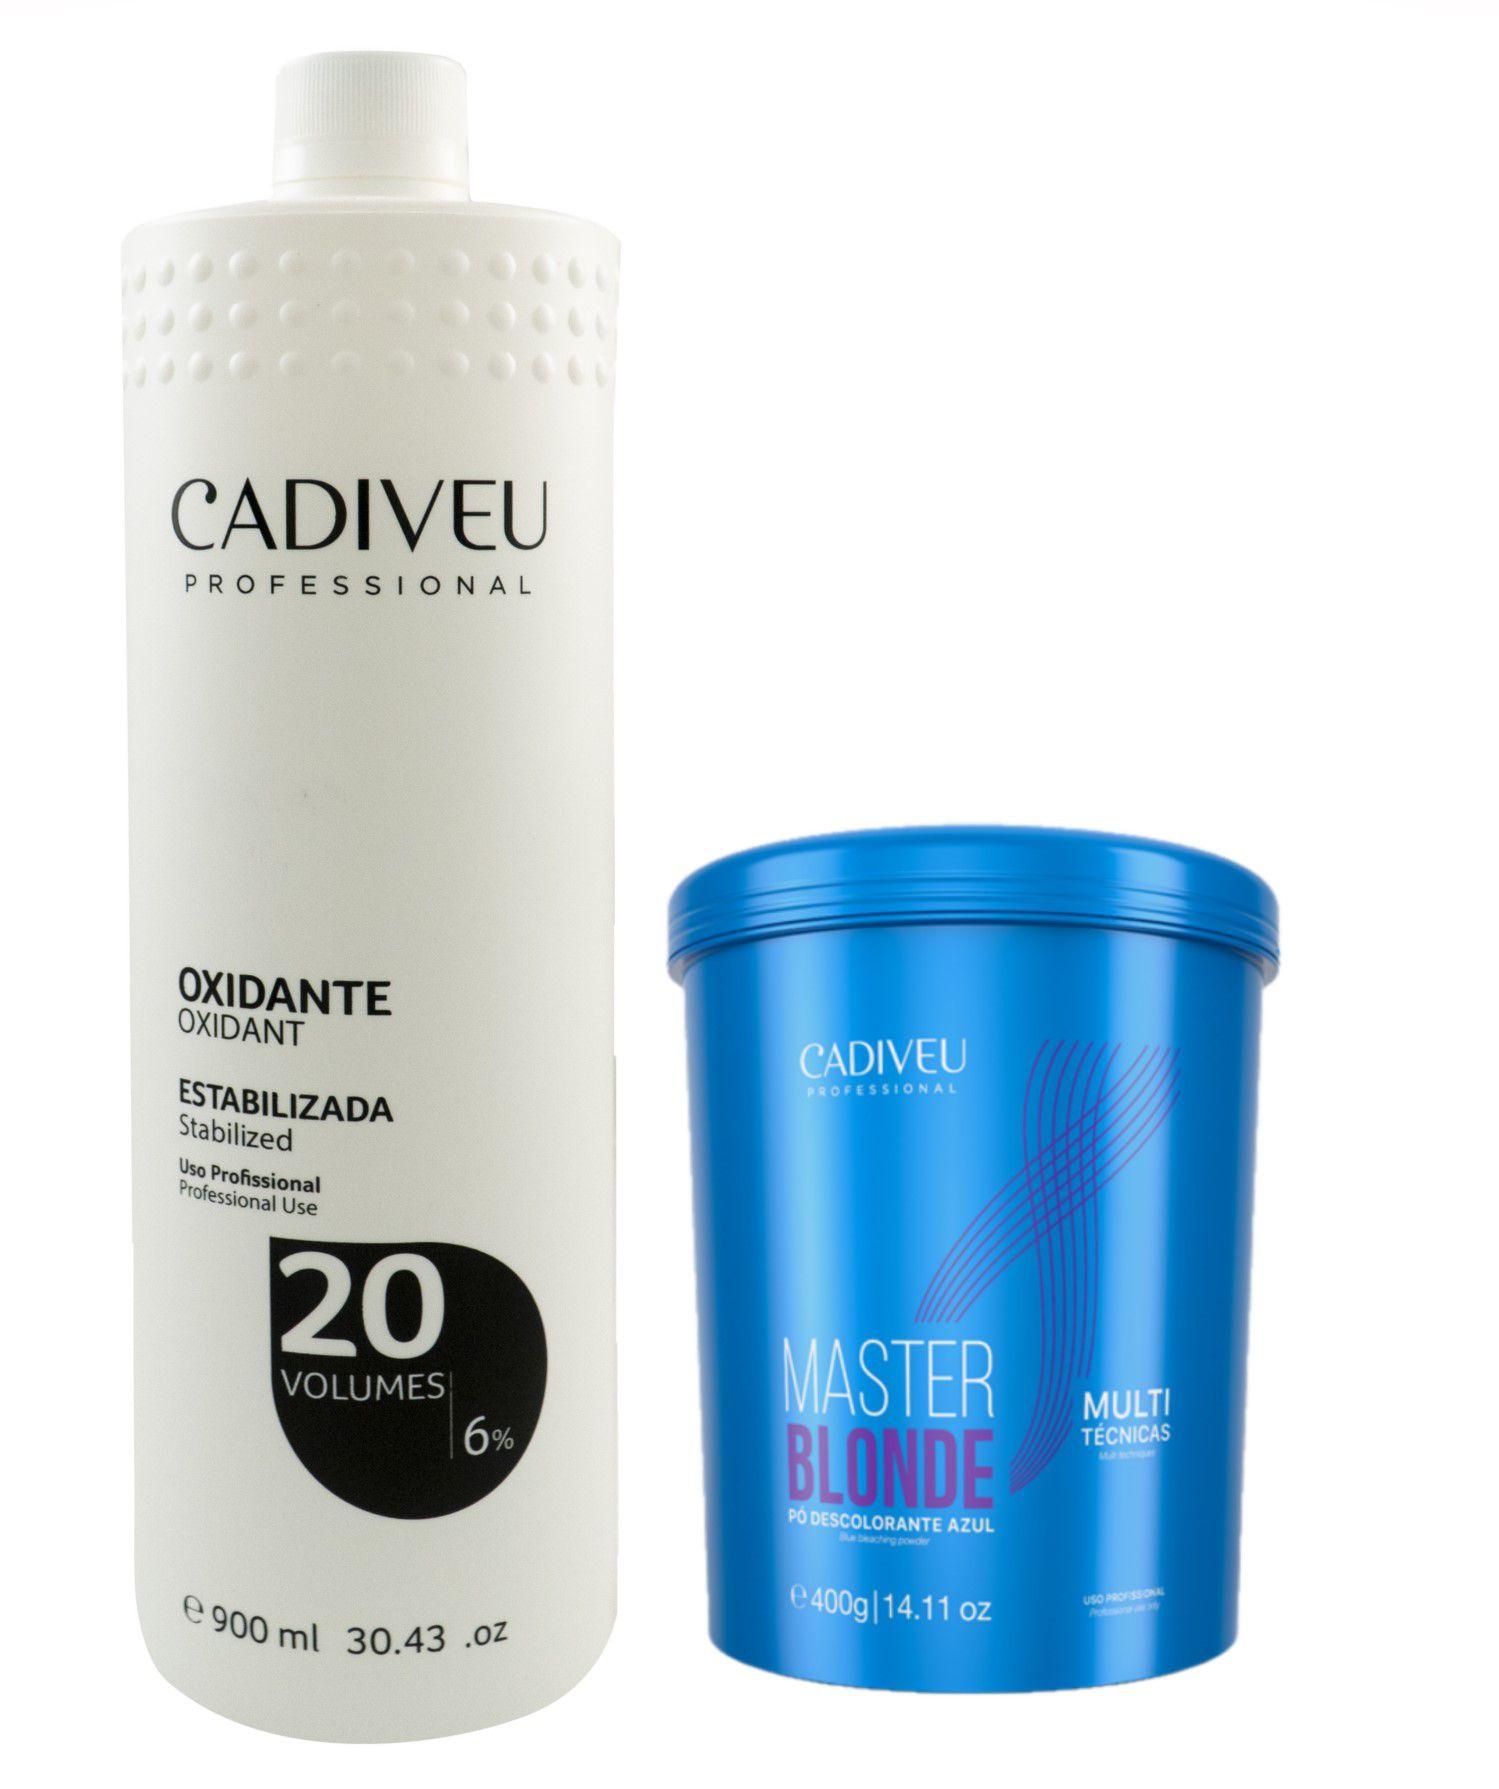 Kit Master Blonde - Cadiveu Professional